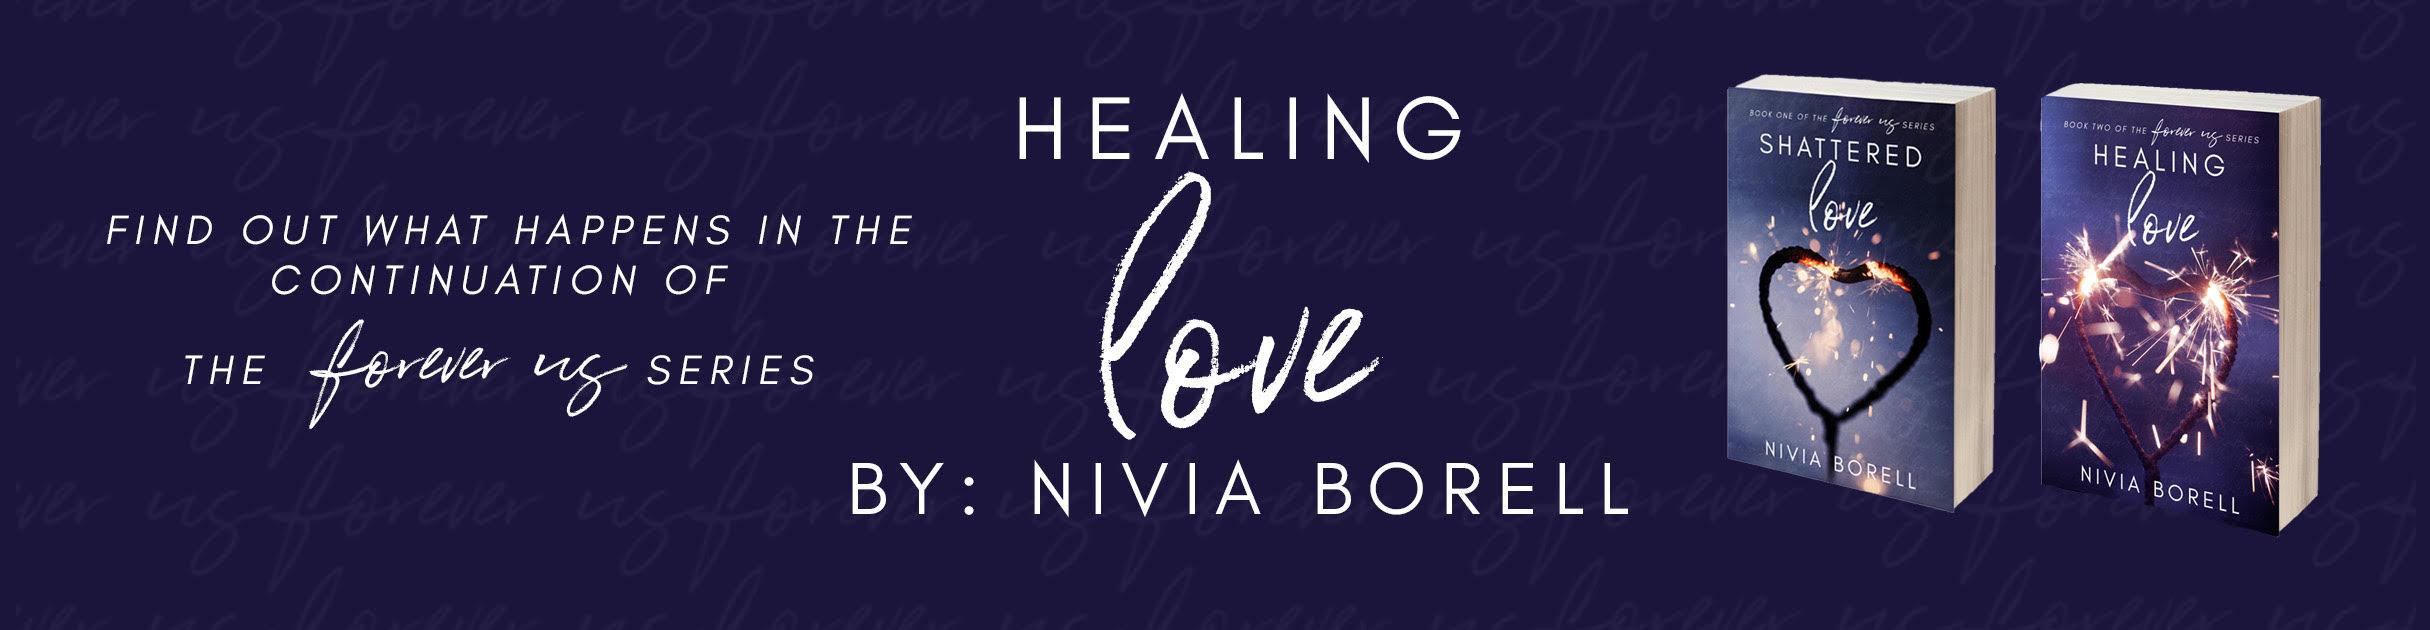 Healing-Love-Banner2.jpg